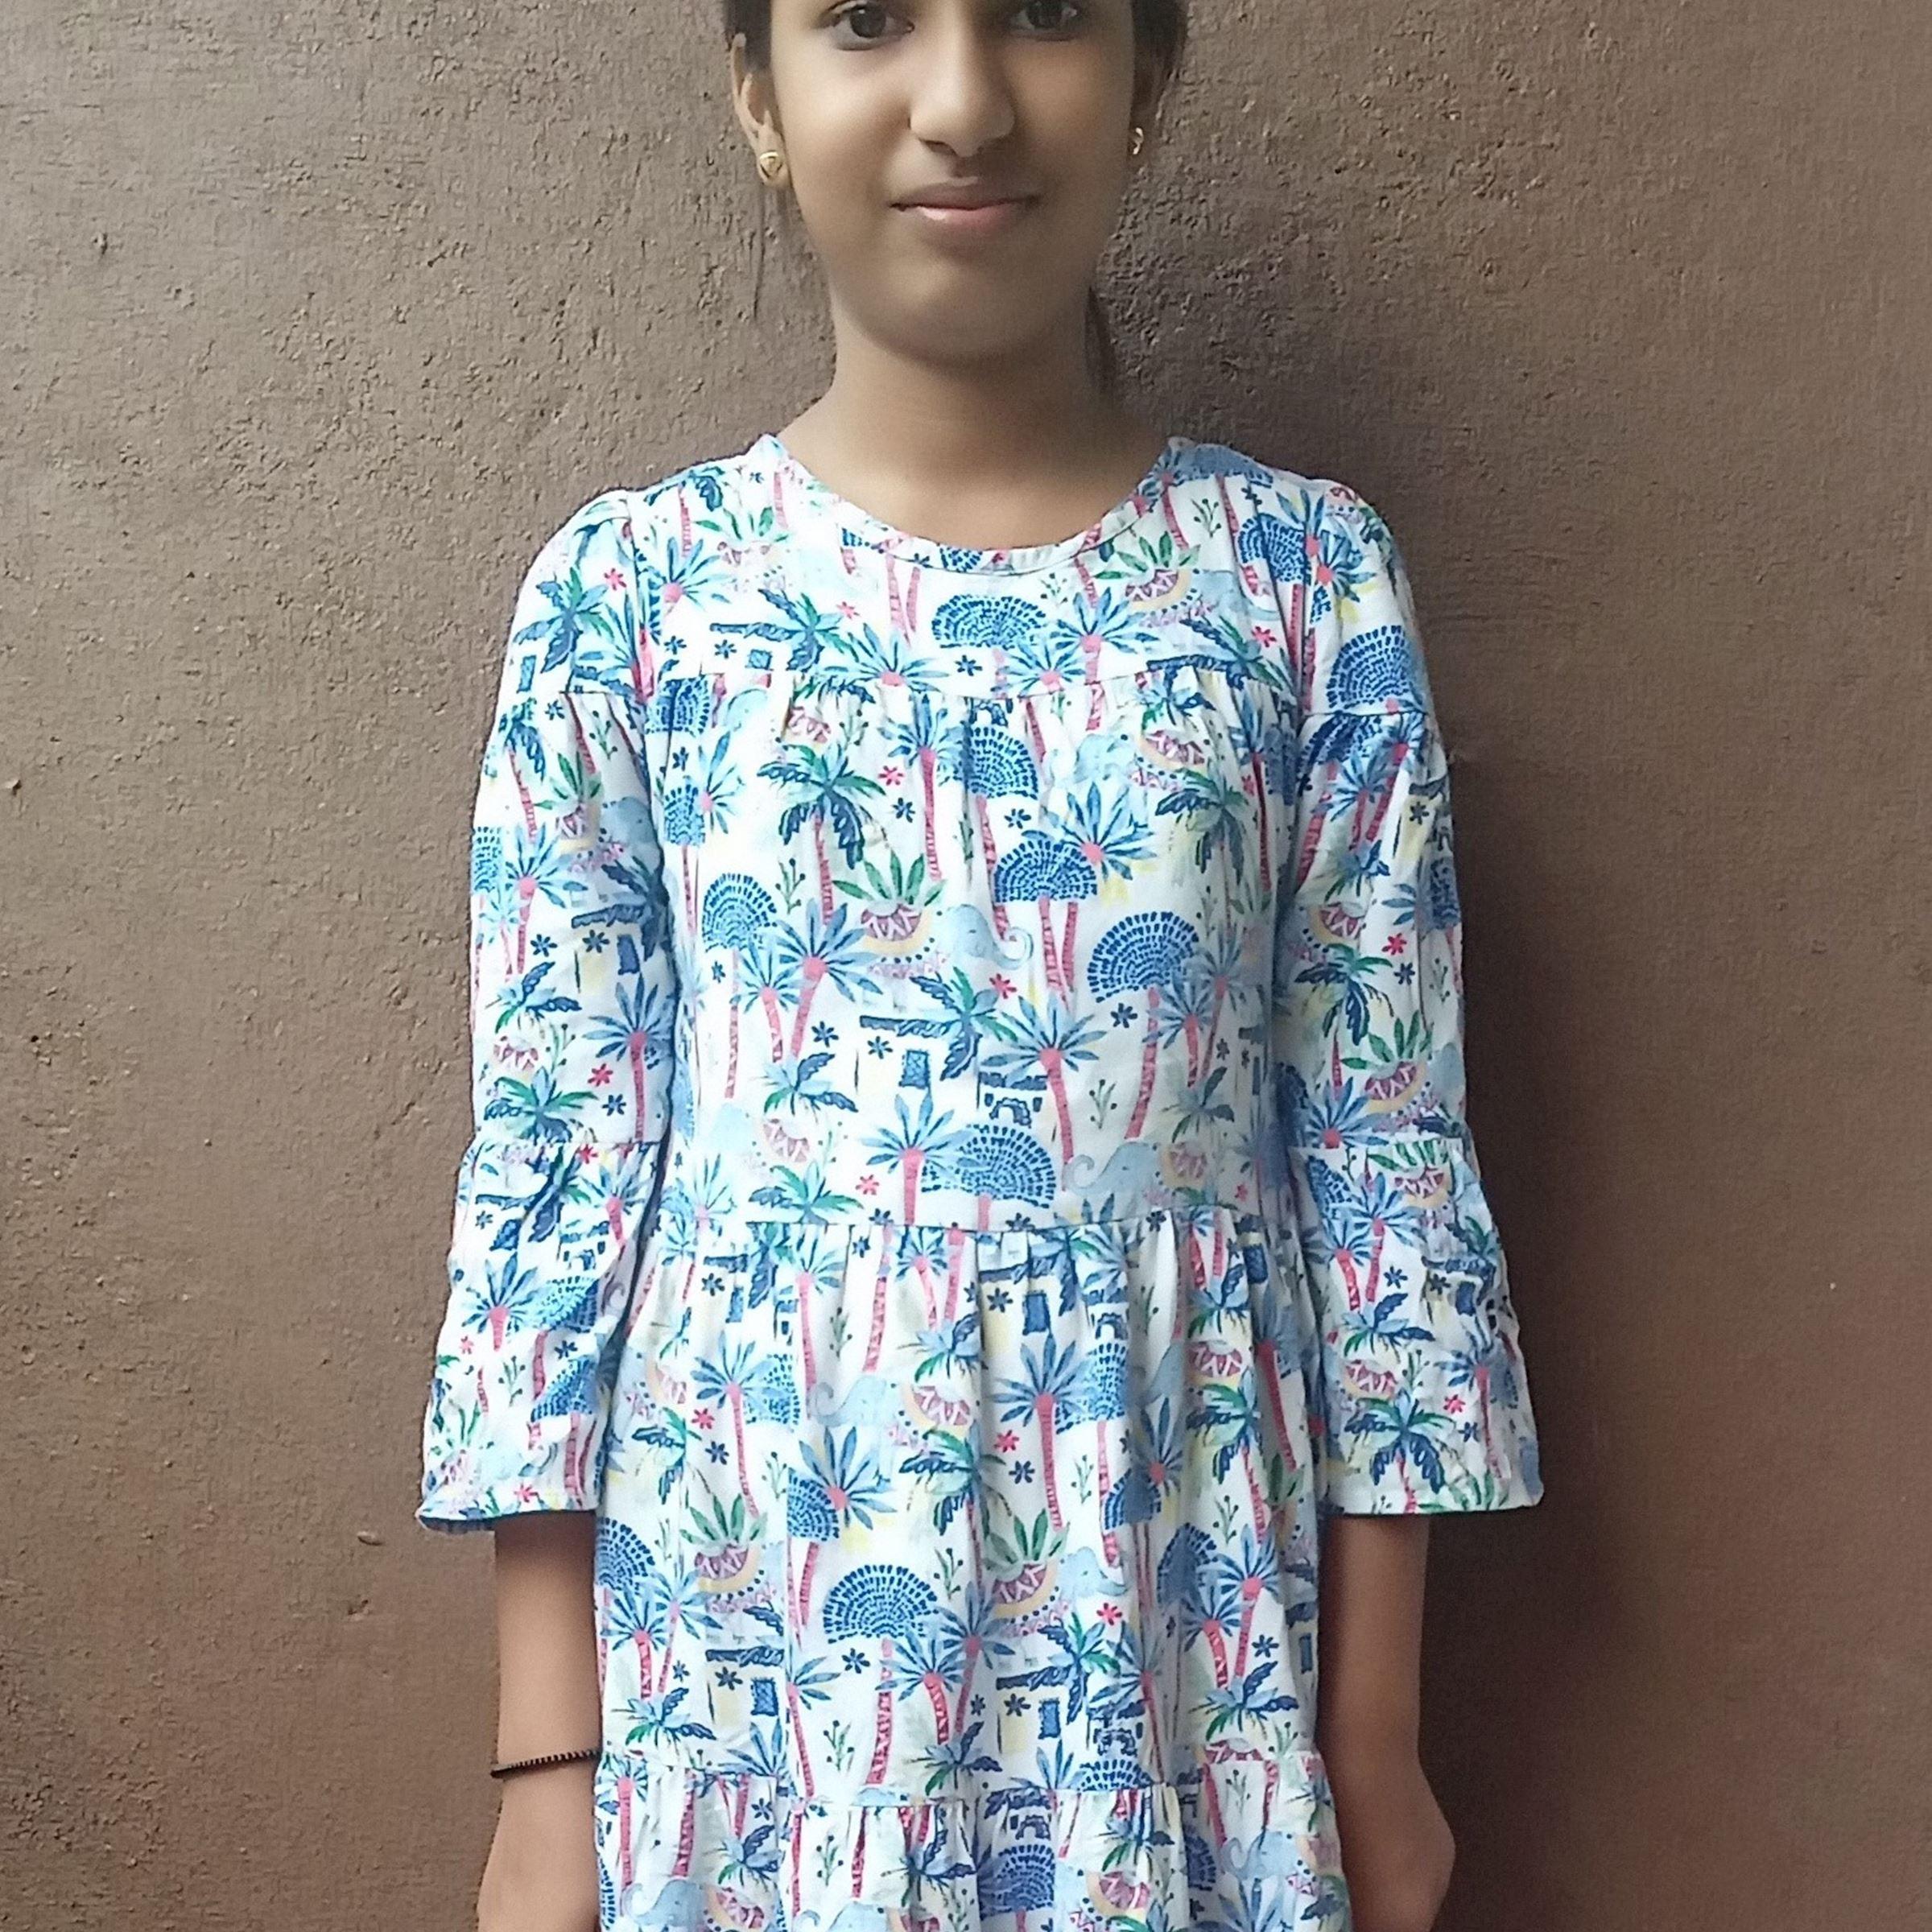 Human Appeal Orphan - Rashidha Banu